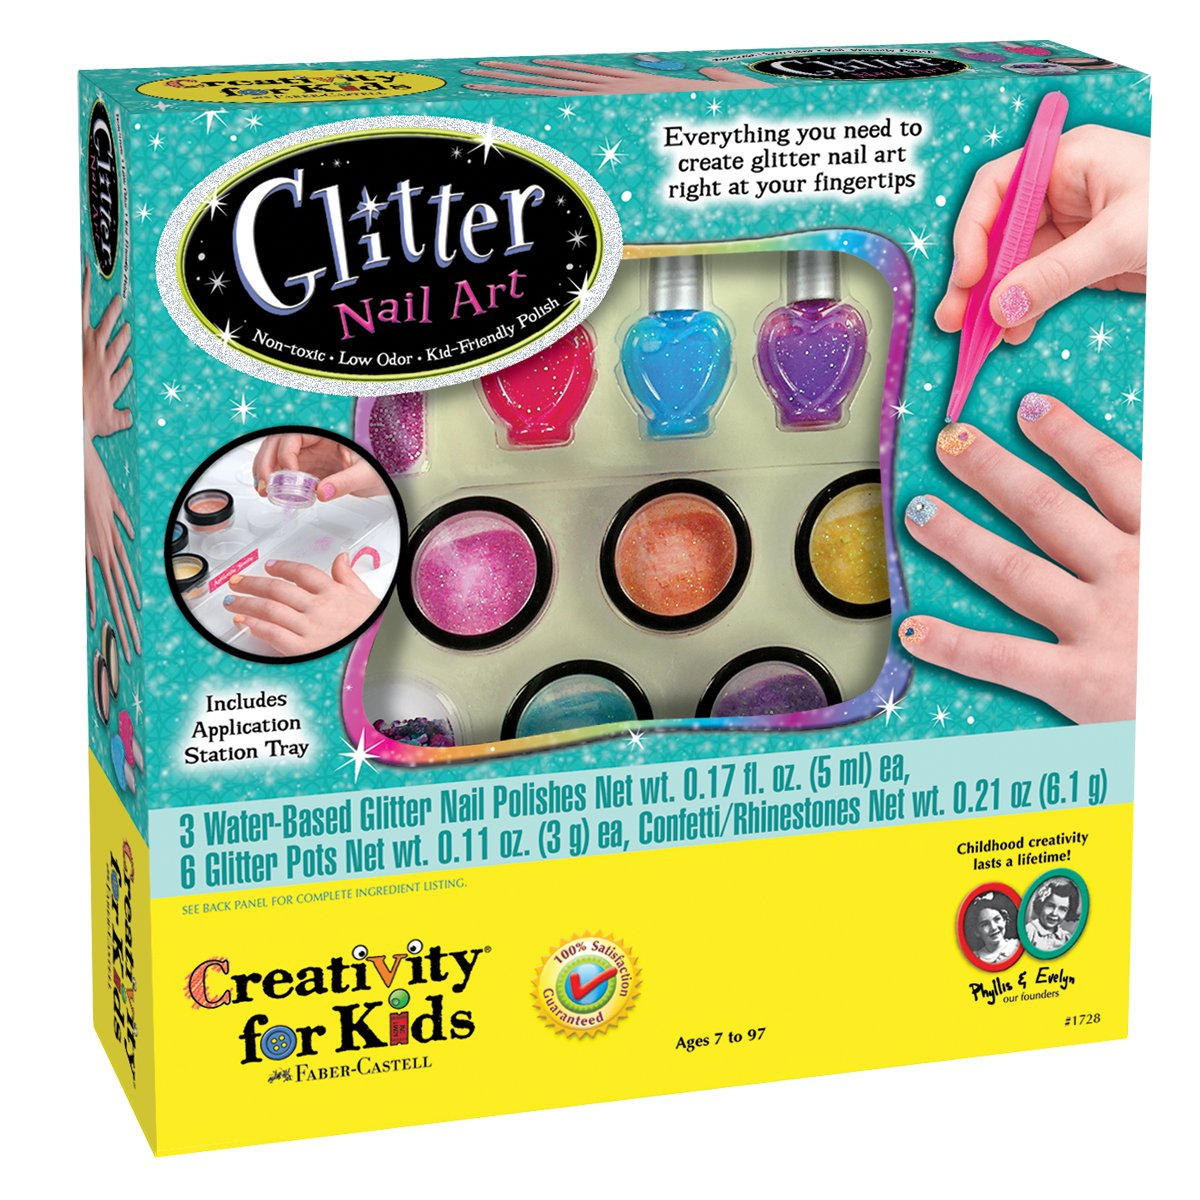 Creativity for Kids Glitter Nail Art - Glitter Manicure Kit for Kits by Creativity for Kids